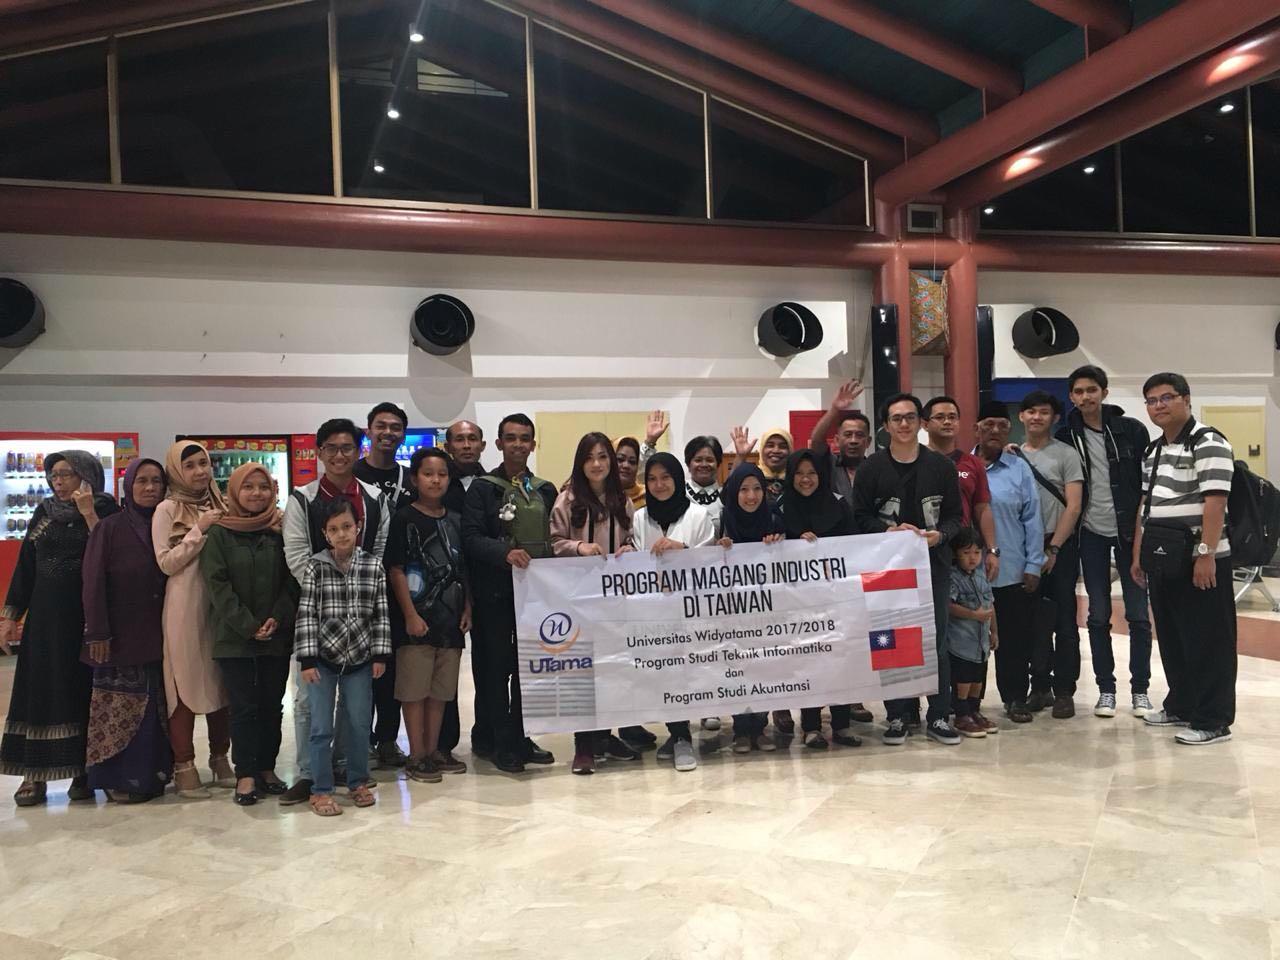 Kloter 2 - 上山大学の20名以上の学生が台湾留学とインターンシップに参加